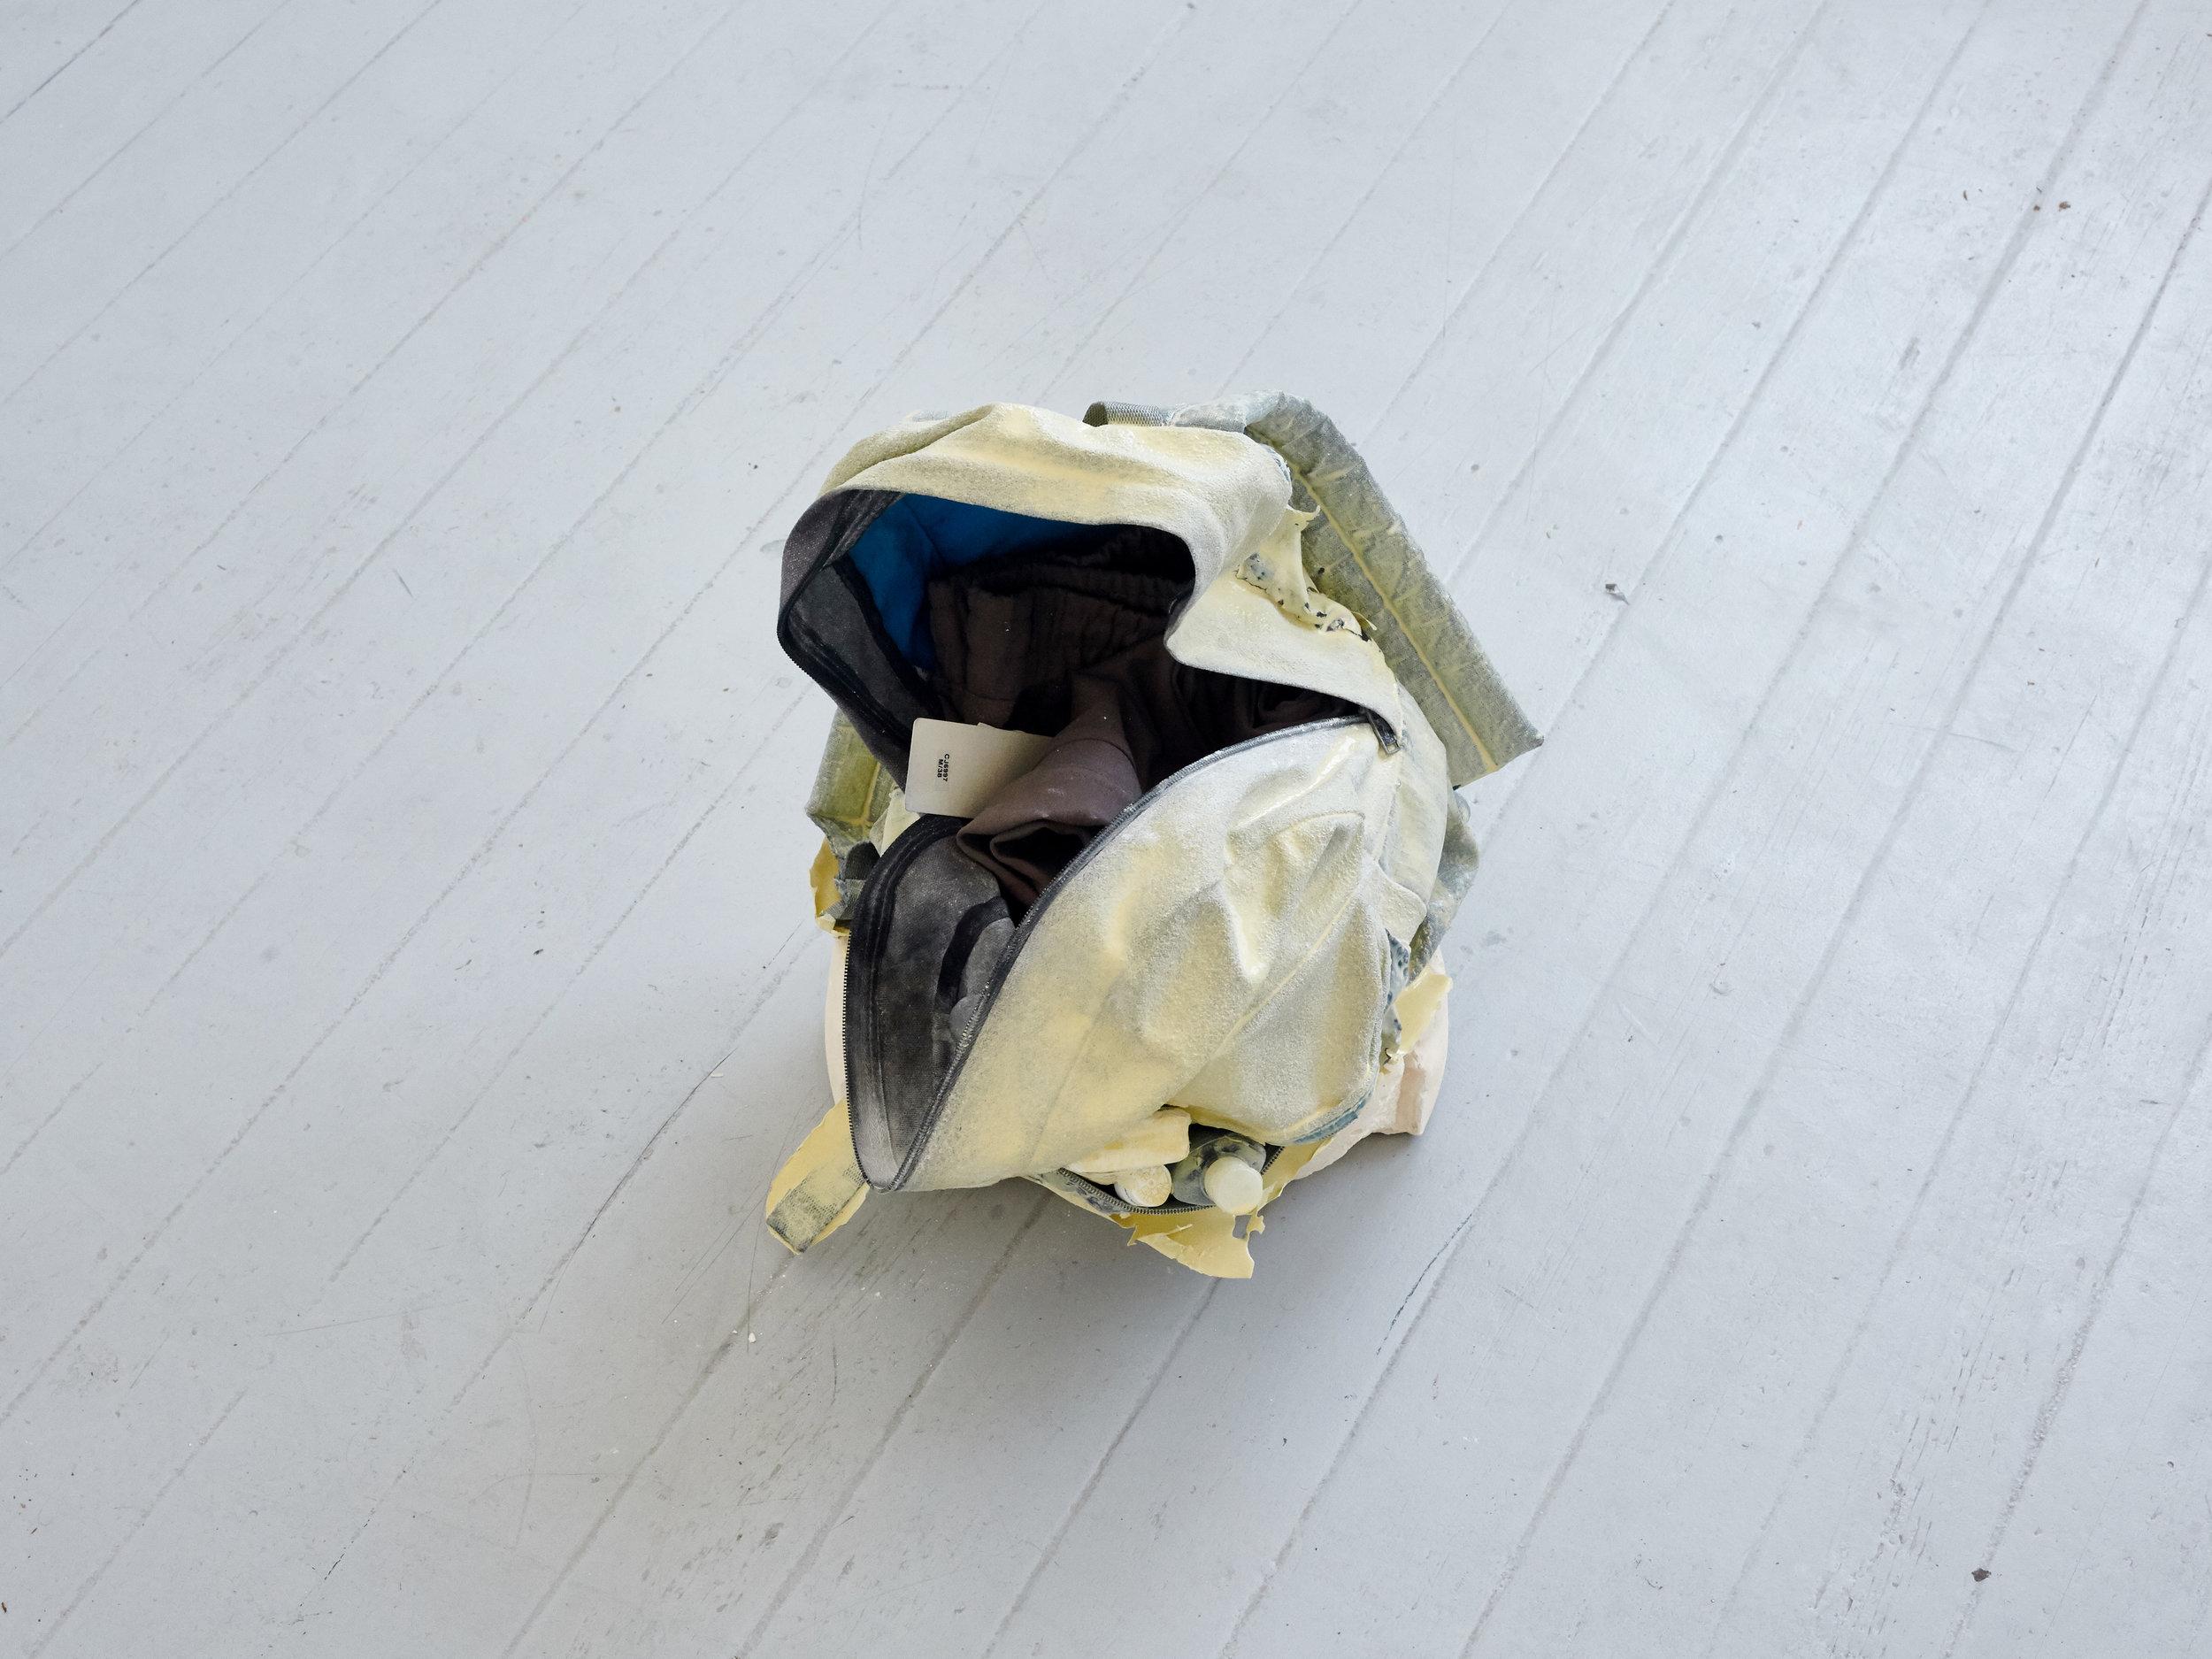 Elif Erkan  Romantic Escapism II – The Sleepover  (2014) Plaster, resin, pigments, polyester, 50 x 30 cm Courtesy: Artist / Artun Alaska Arasli, Amsterdam, Netherlands